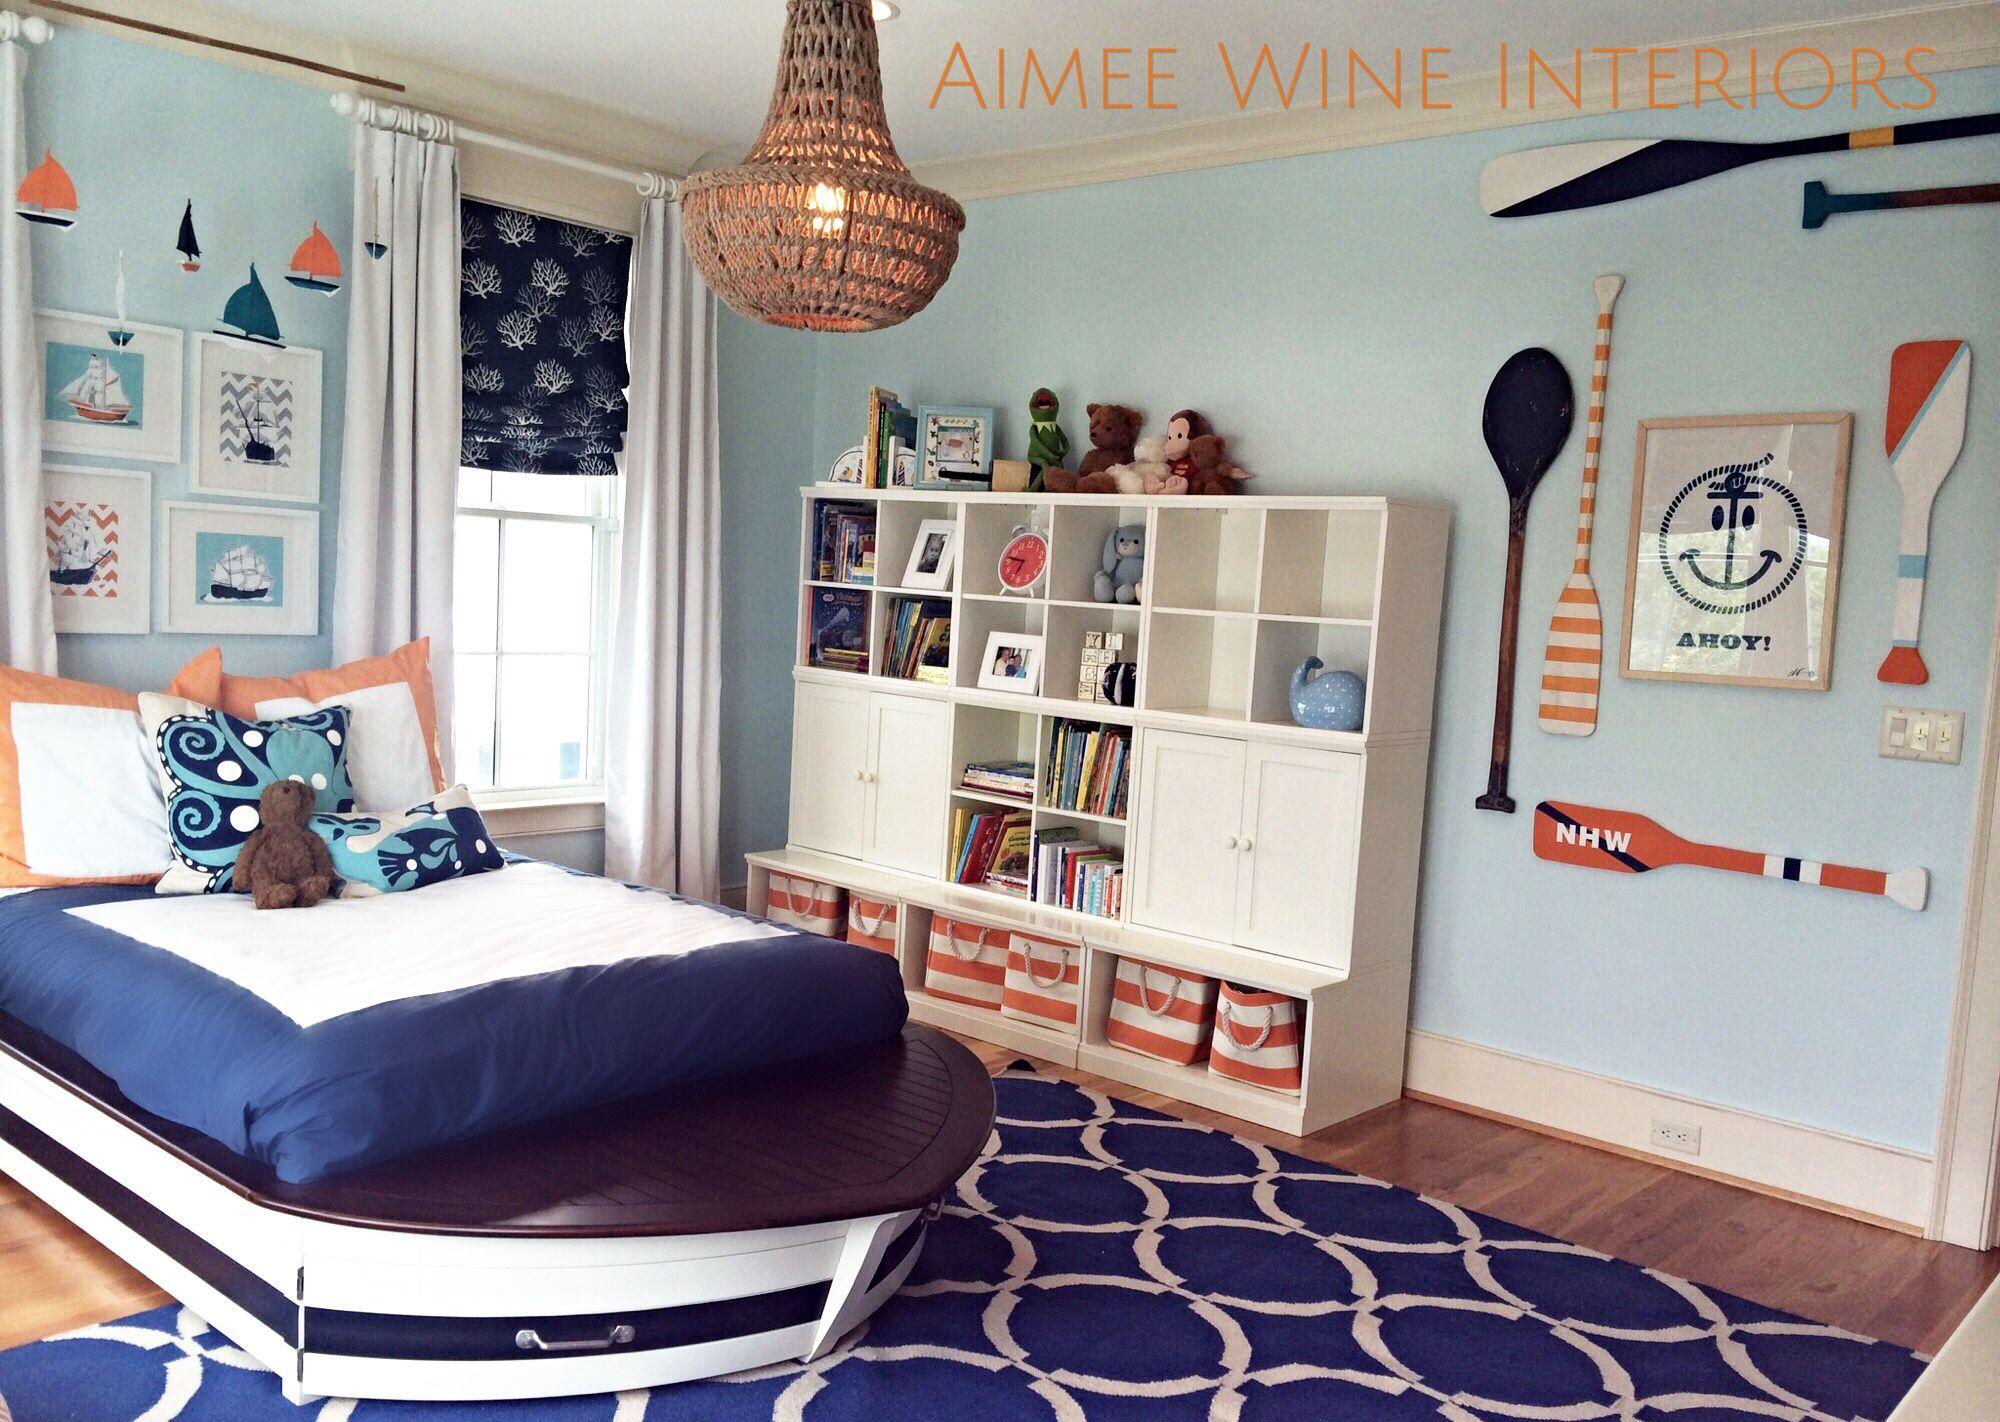 nautical boys room boat bed navy orange aqua and rope accents nautical boys room boat bed navy orange aqua and rope accents